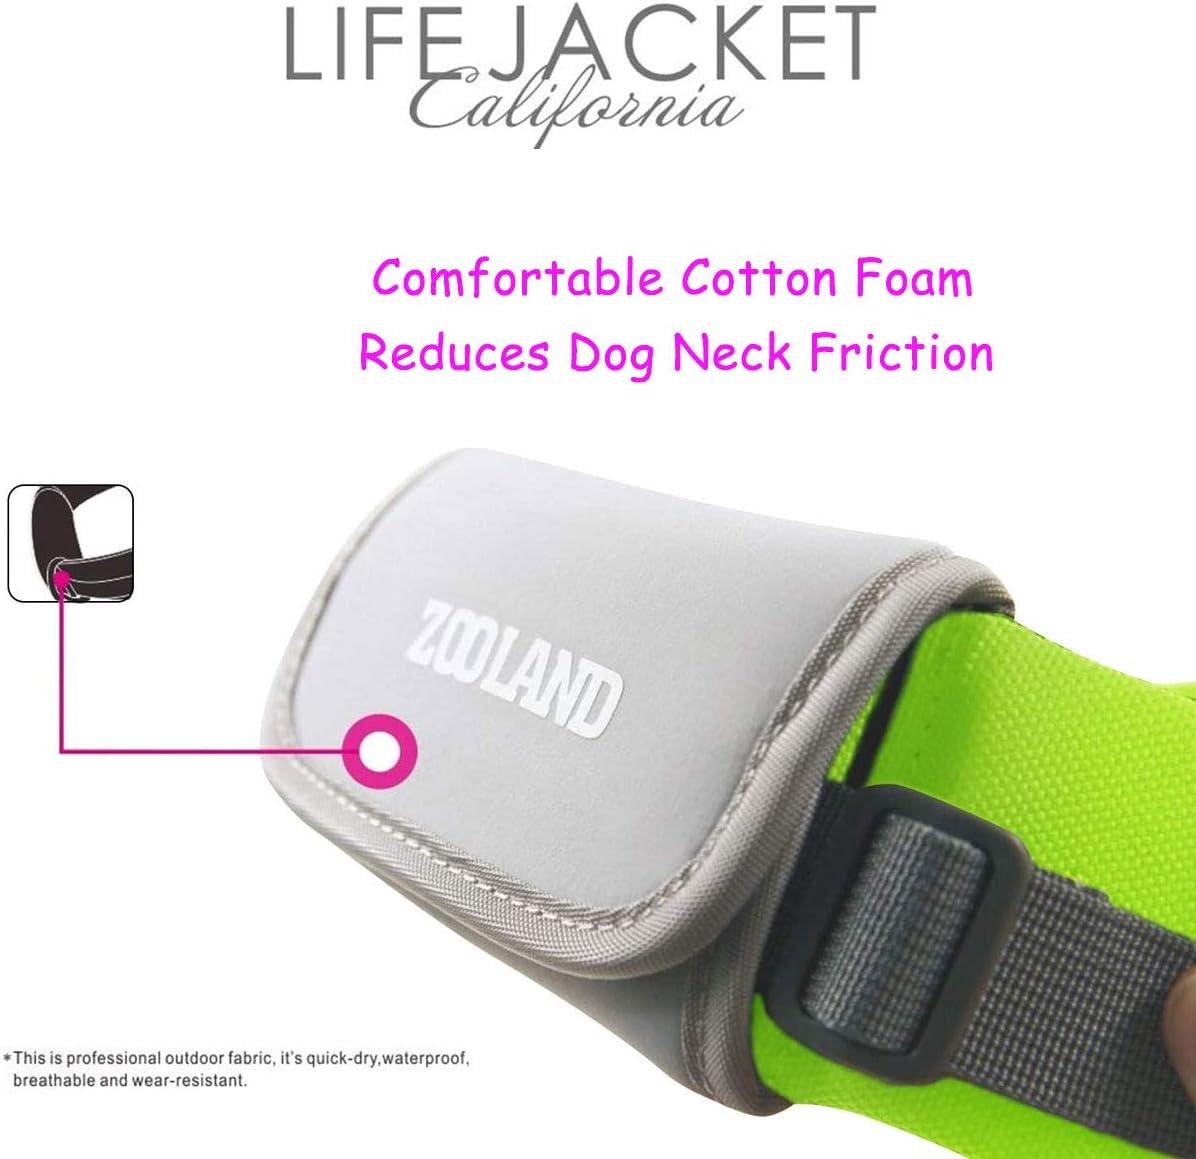 Reflective /& Adjustable Pets Float Coat for Swimming Floatation Pet Swim Life Vest with Dogs Leash Safety Dog Life Jacket